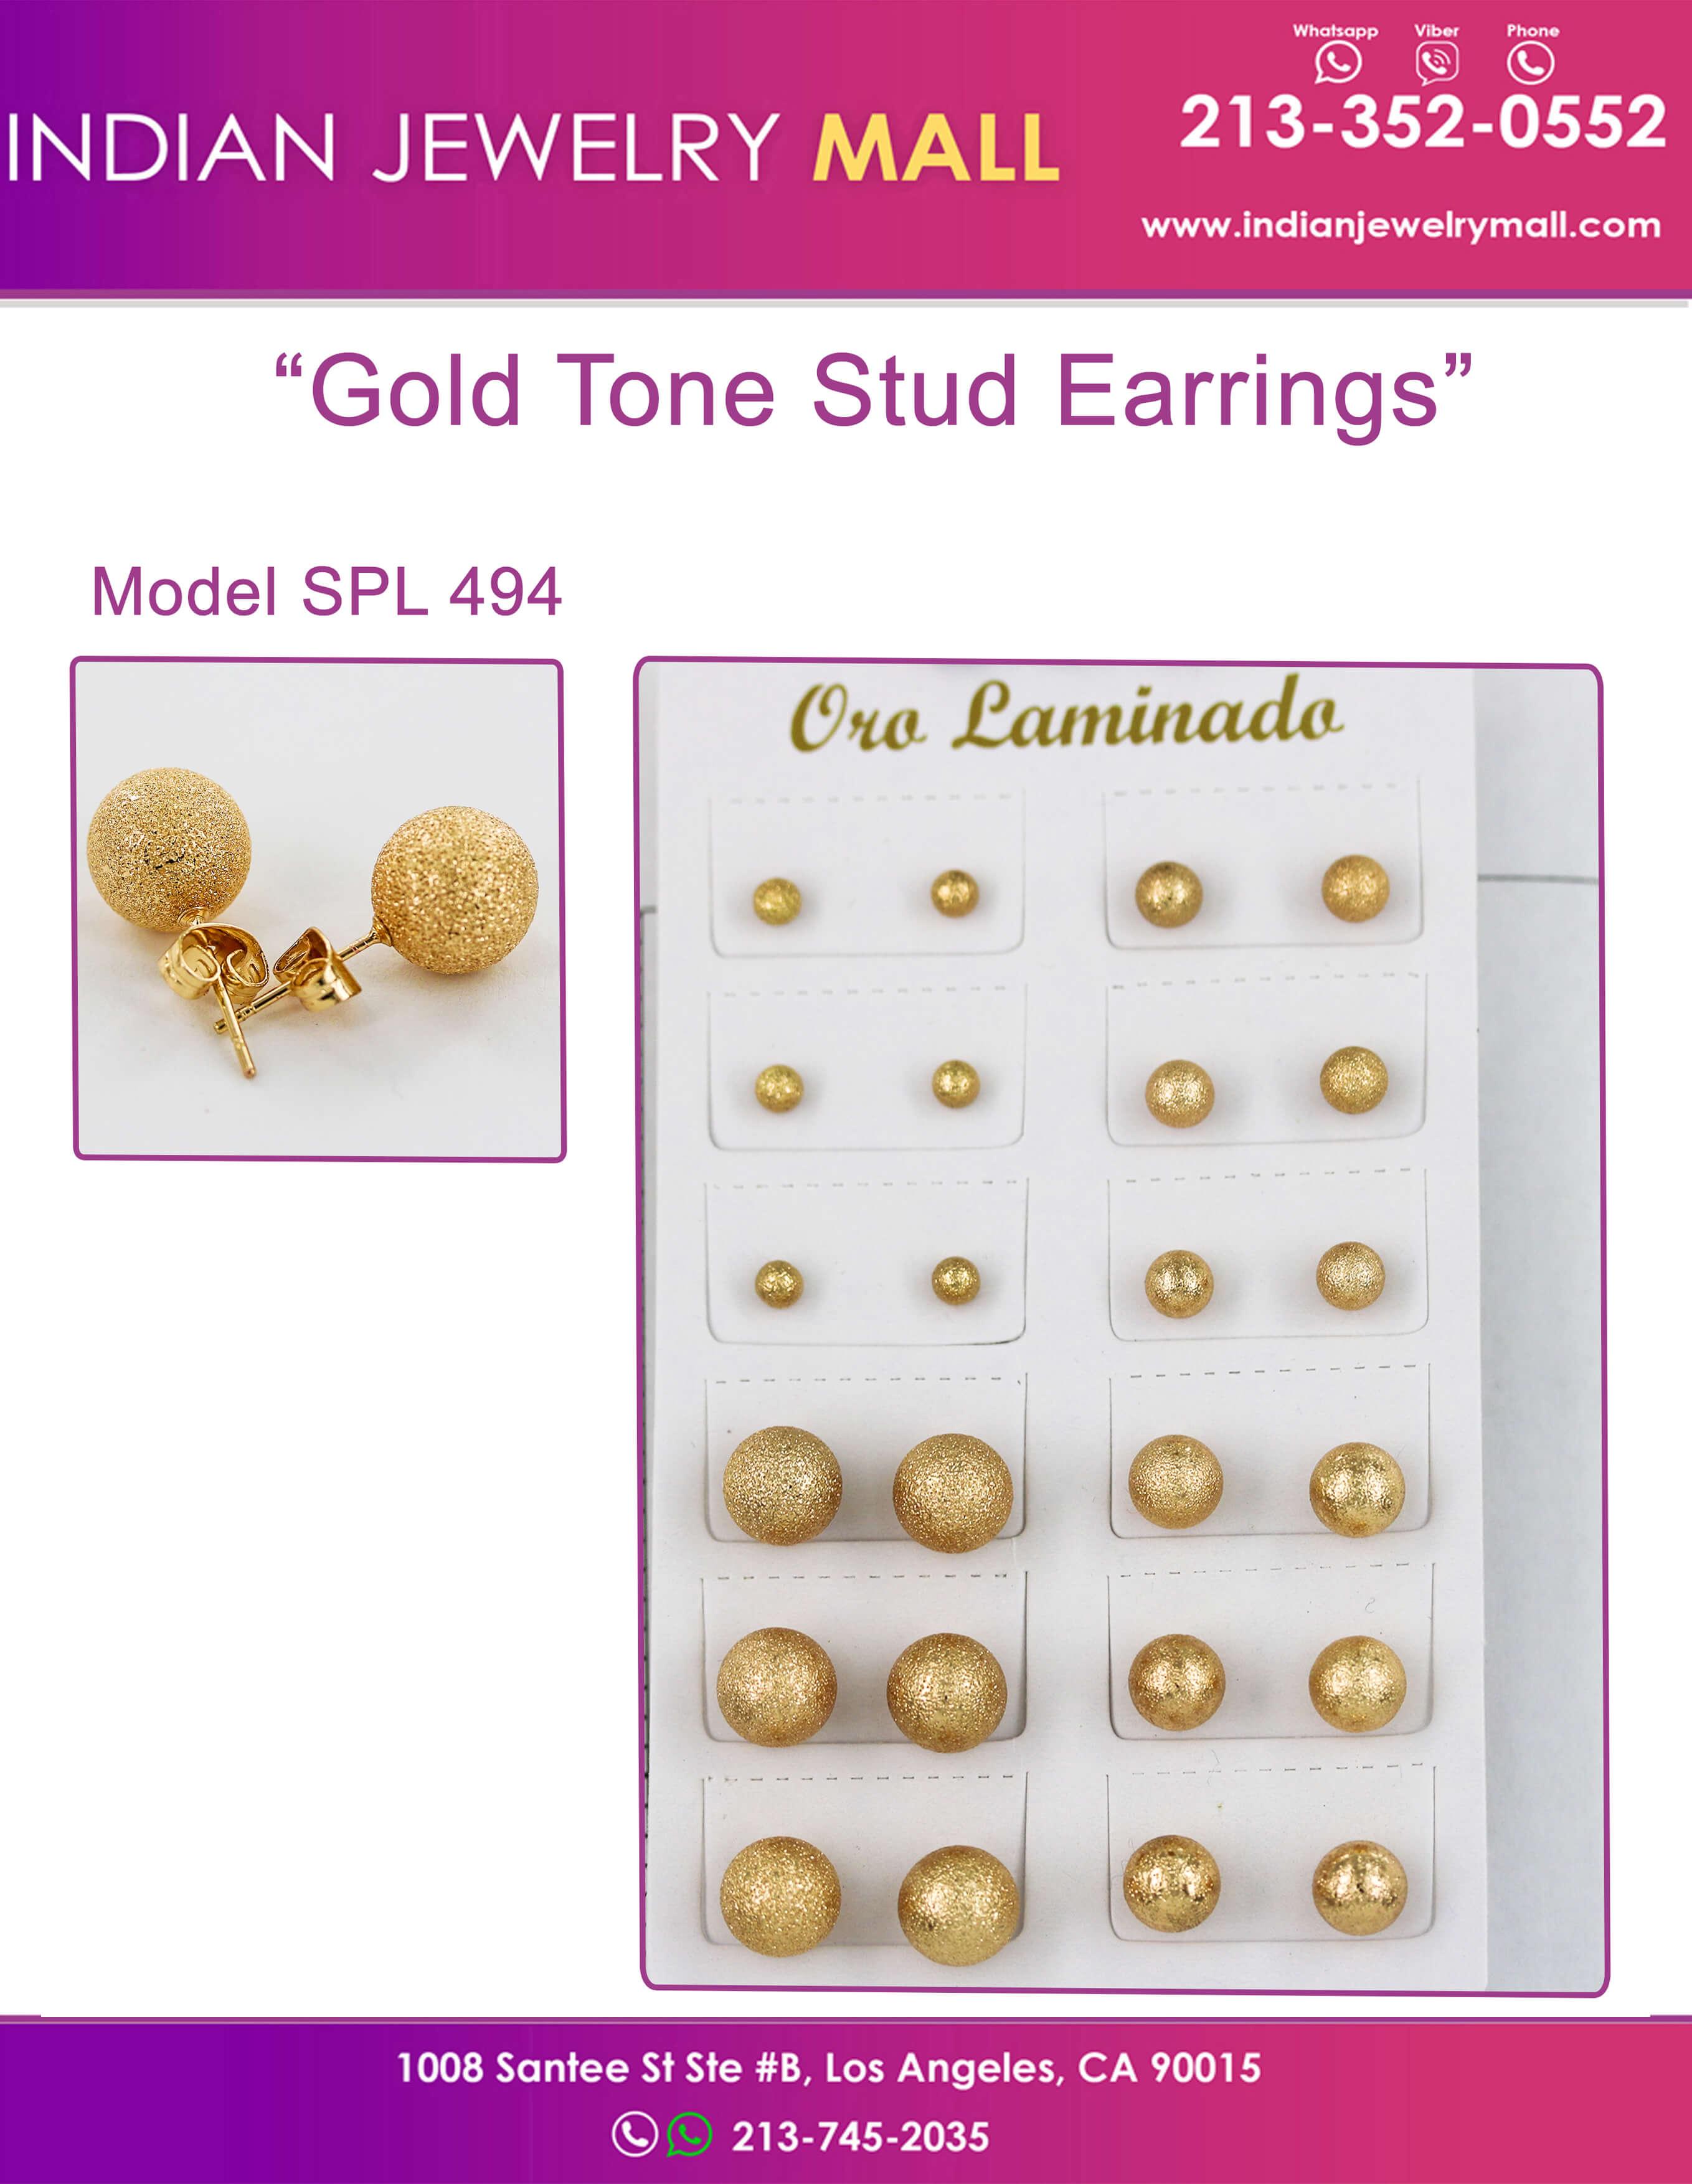 Gold Tone Stud Earrings - Oro Laminado Indian Jewelry Mall